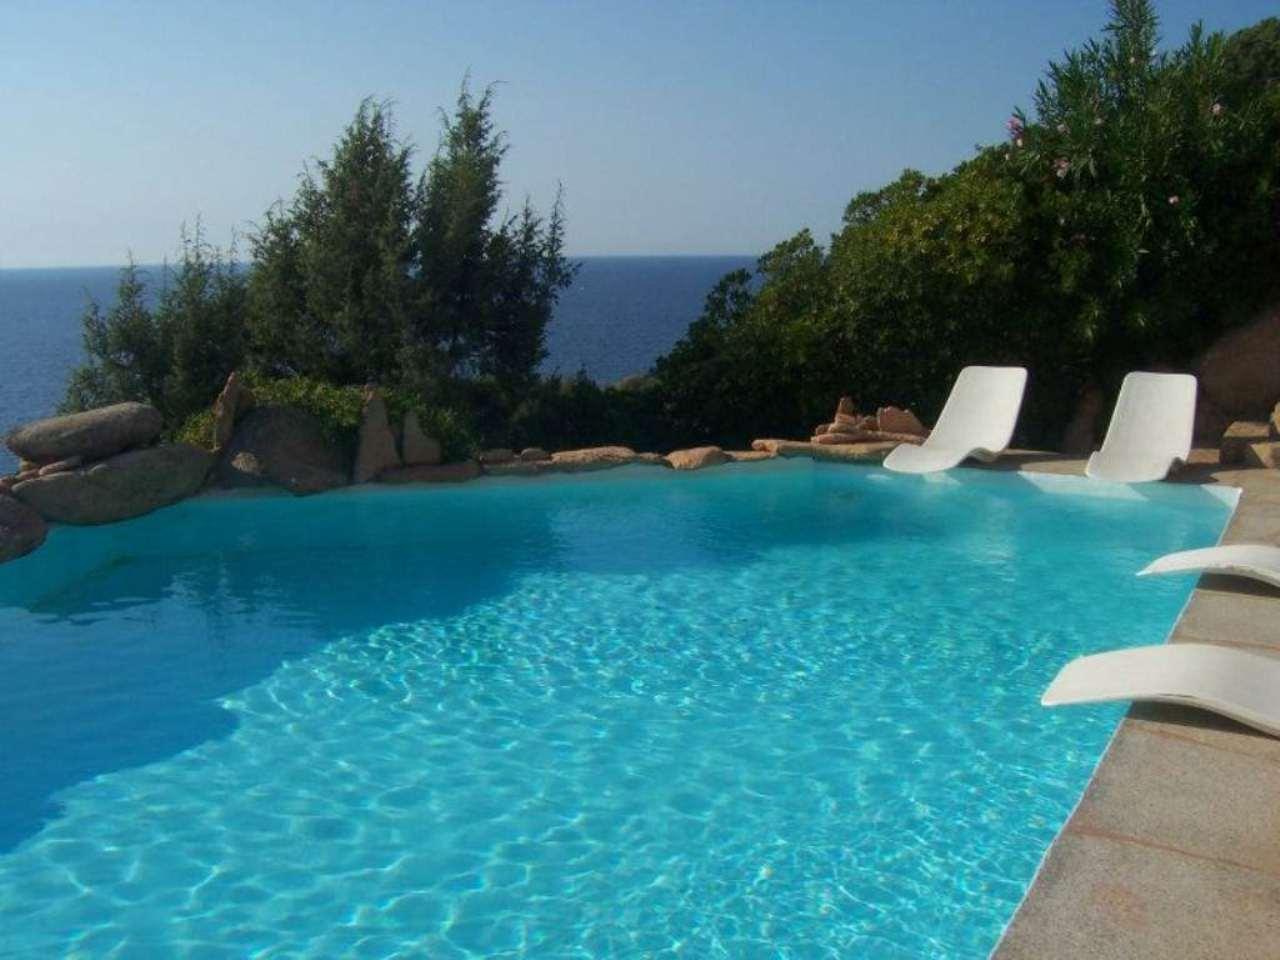 Villa in vendita a Trinità d'Agultu e Vignola, 5 locali, Trattative riservate | CambioCasa.it